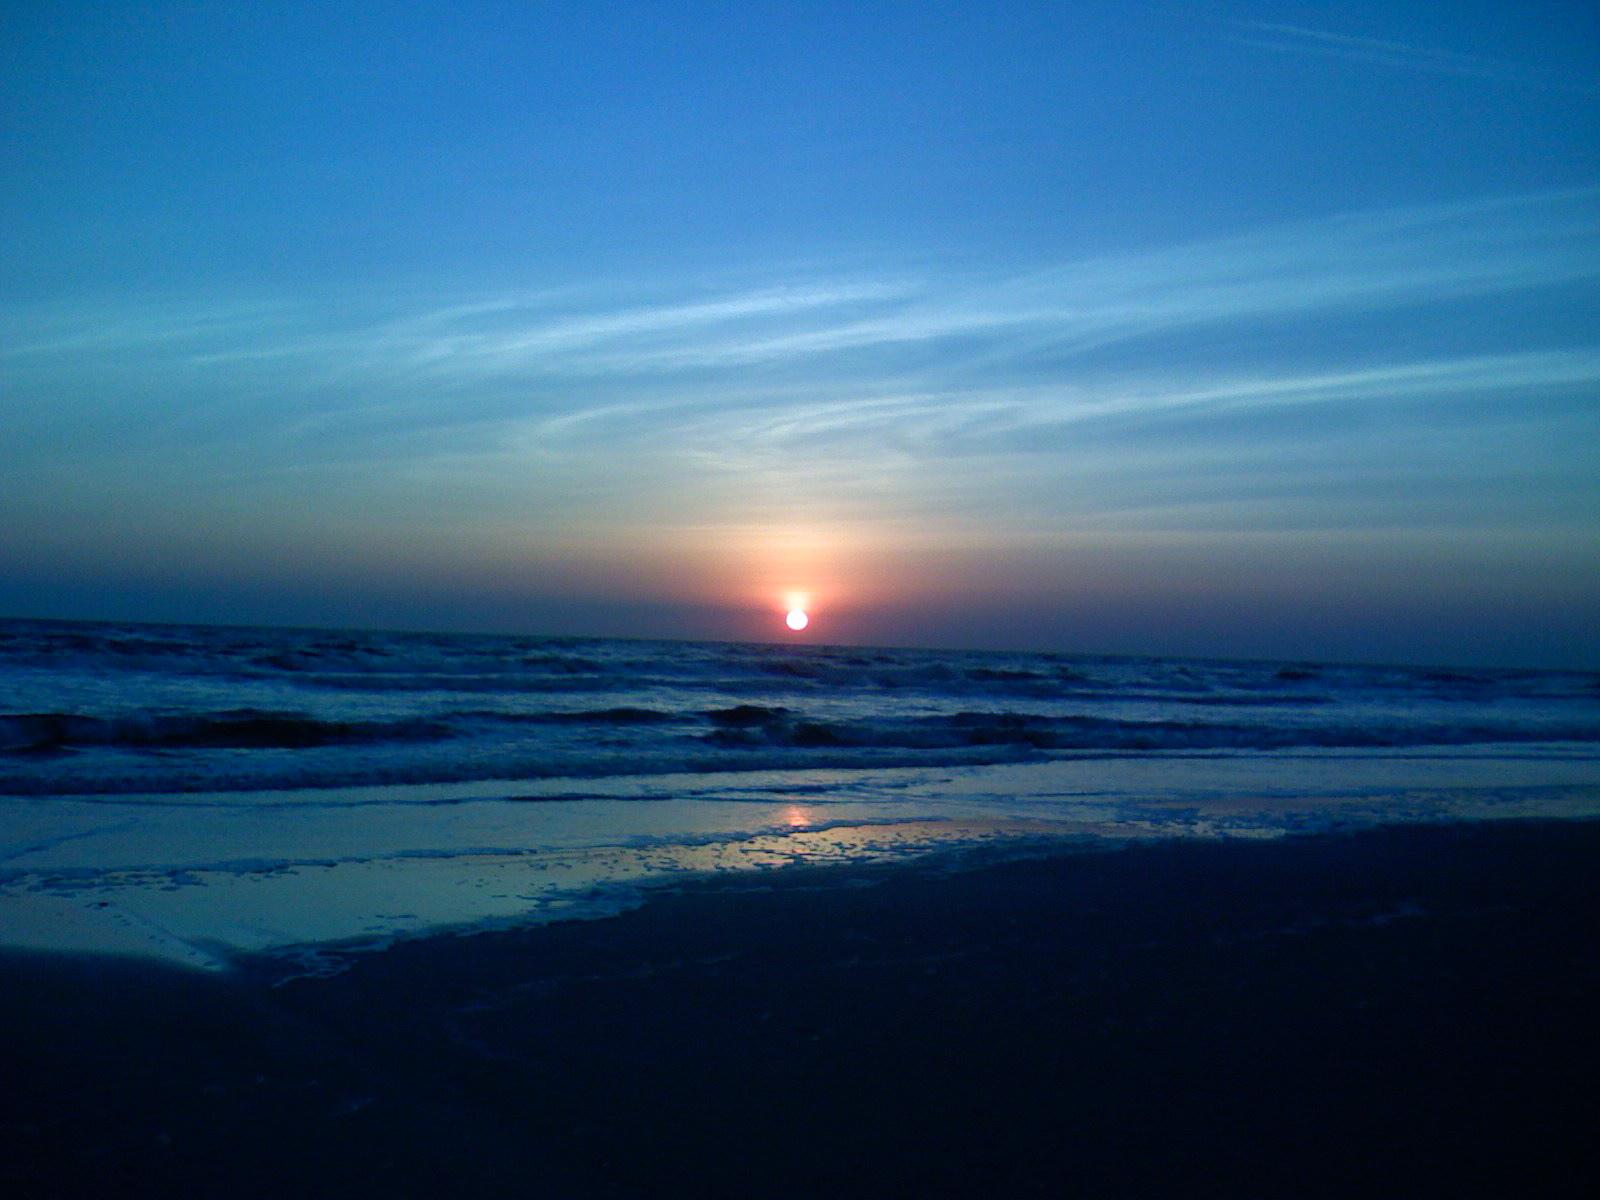 (c) bob traupman 2007. all rights reserved.  st. augustine beach, fl